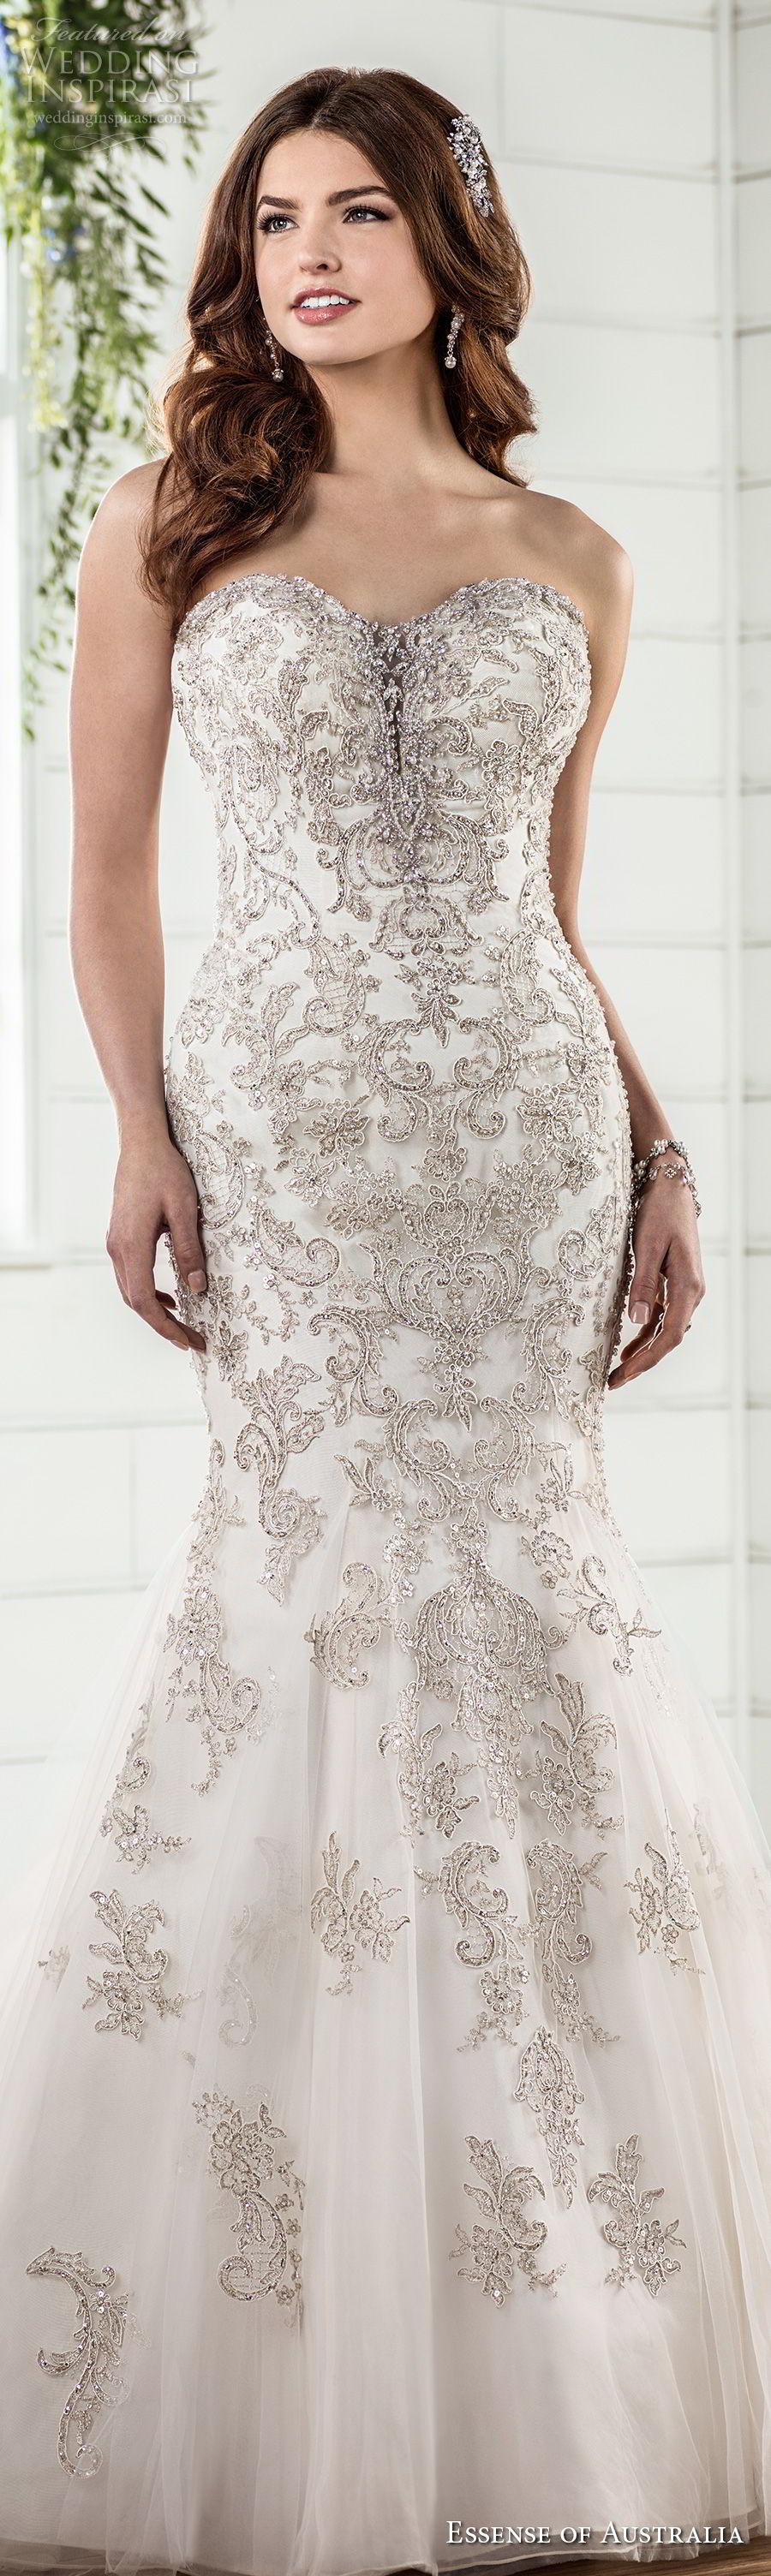 Australian Essence Wedding Dresses 84 Stunning essense australia fall bridal